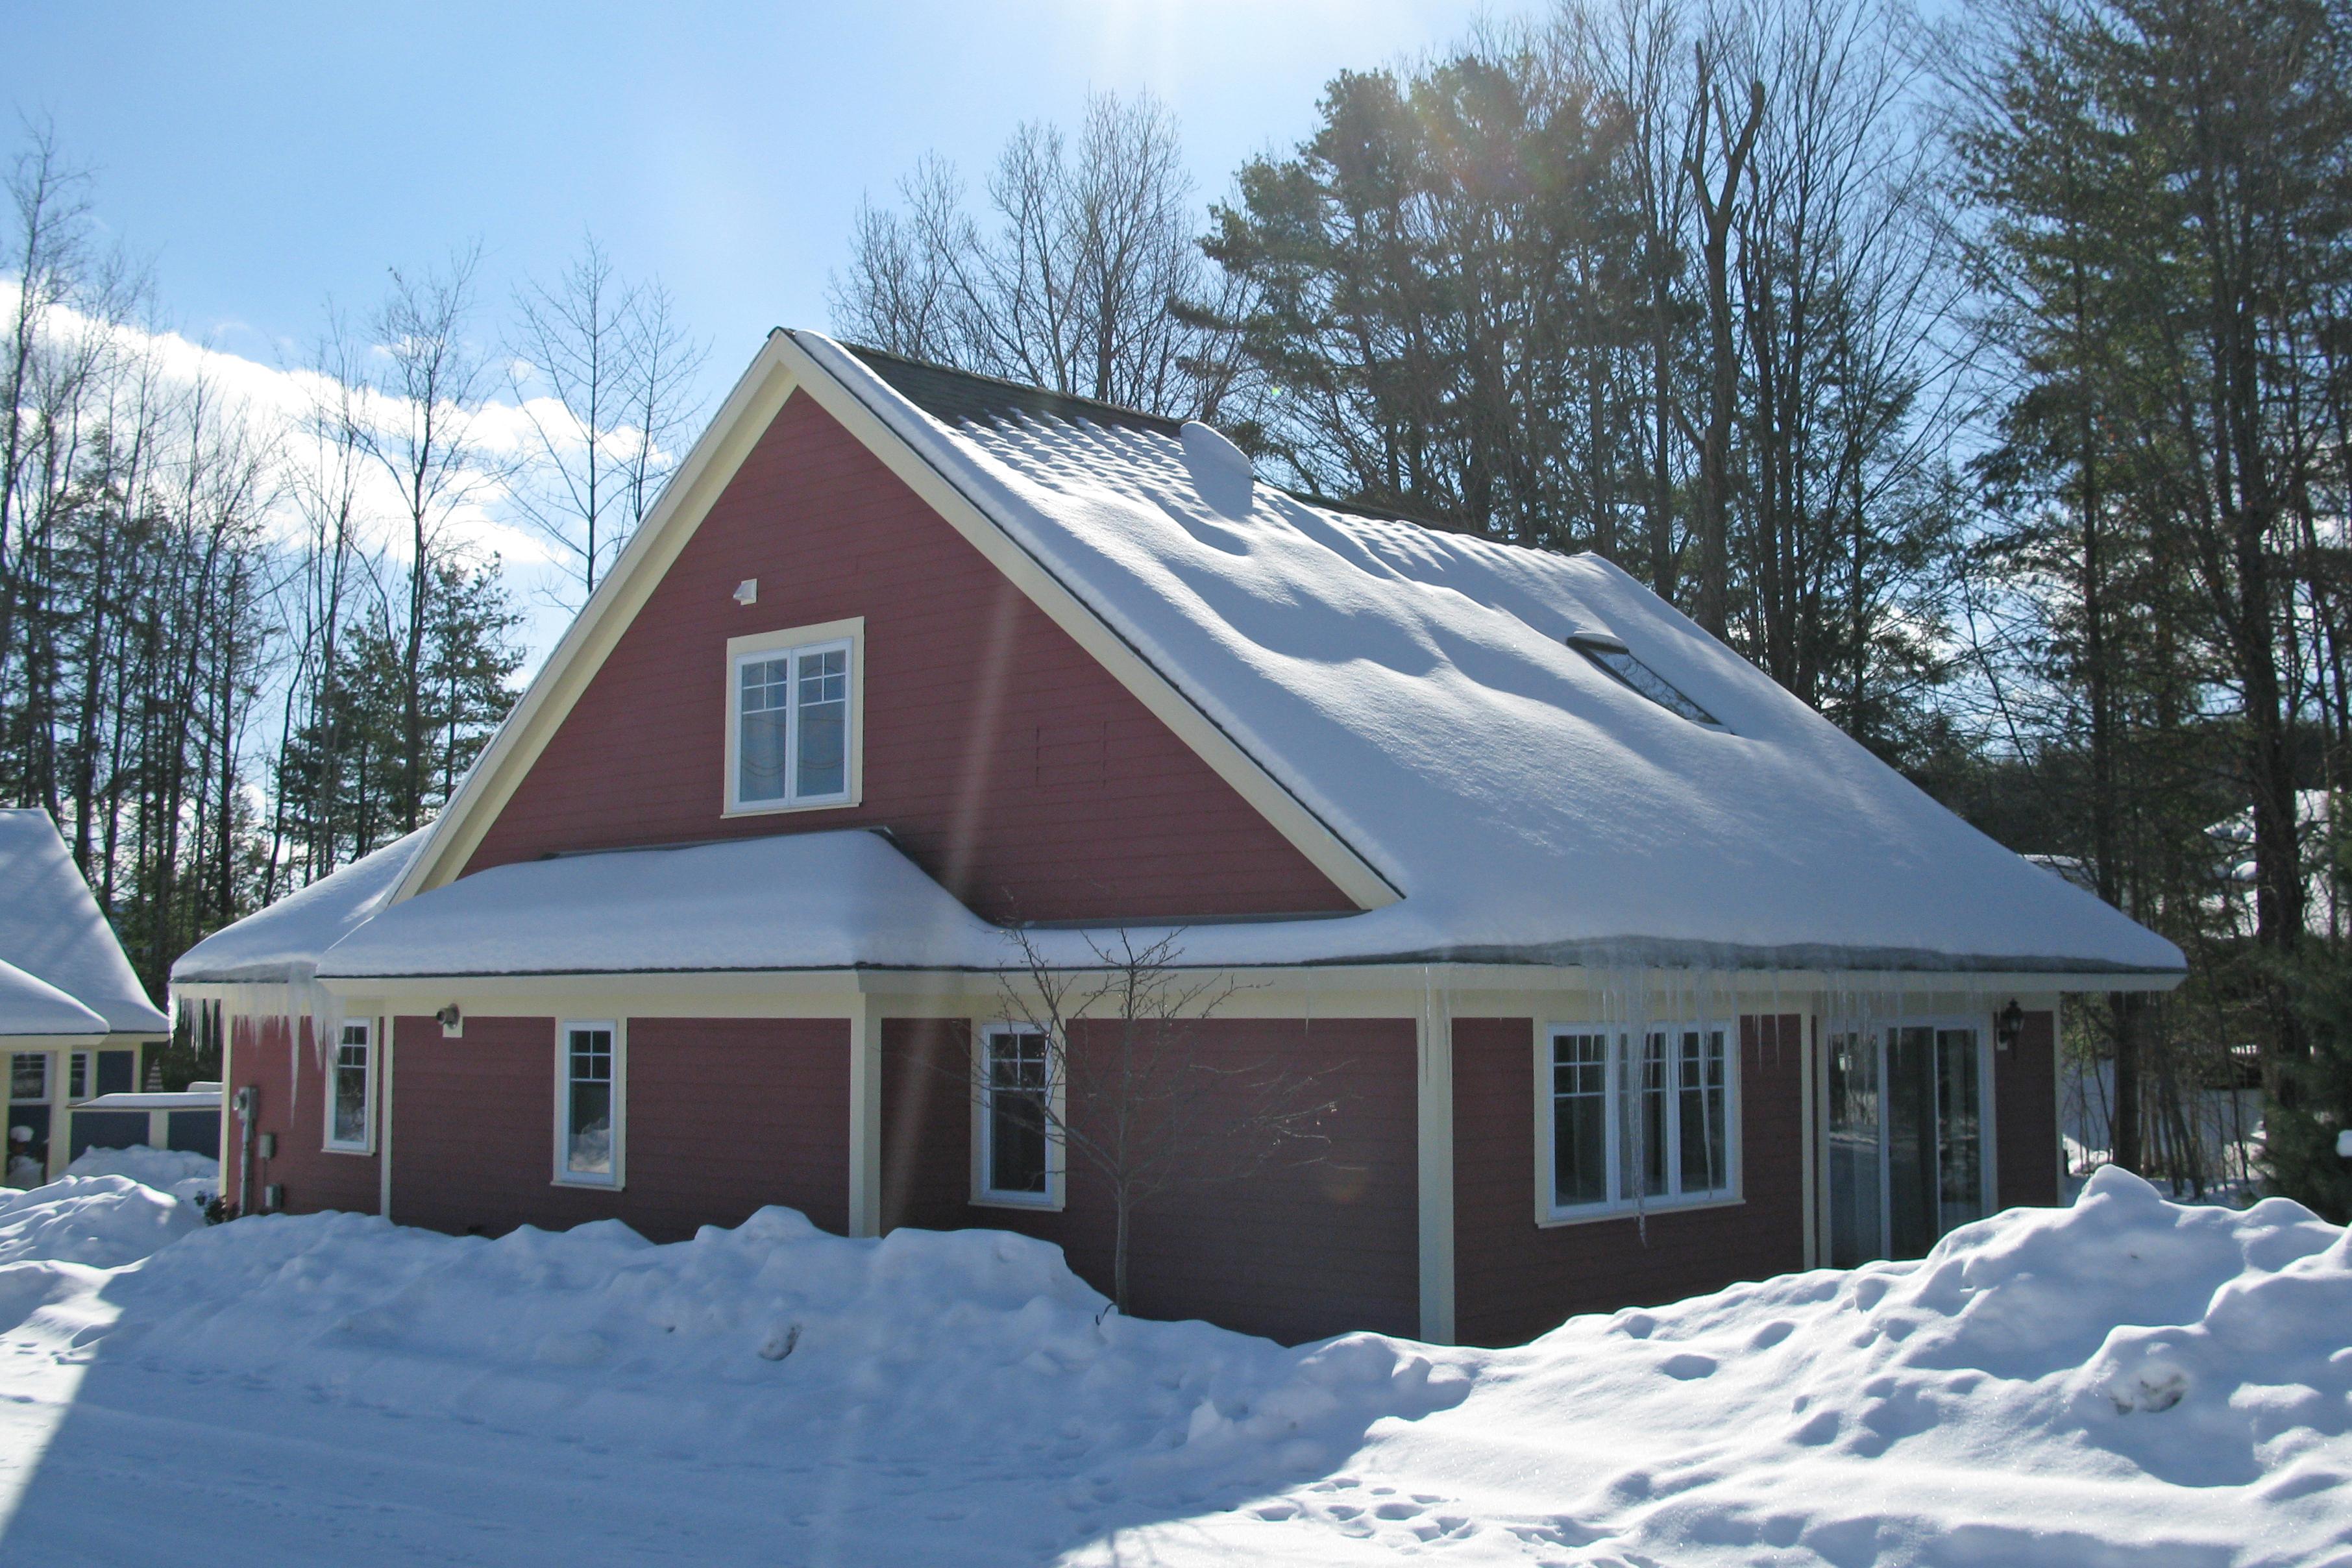 Singles in hartford vermont Hartford VT Homes For Sale, Hanover NH Real Estate, Lebanon NH Real Estate, Upper Valley Homes